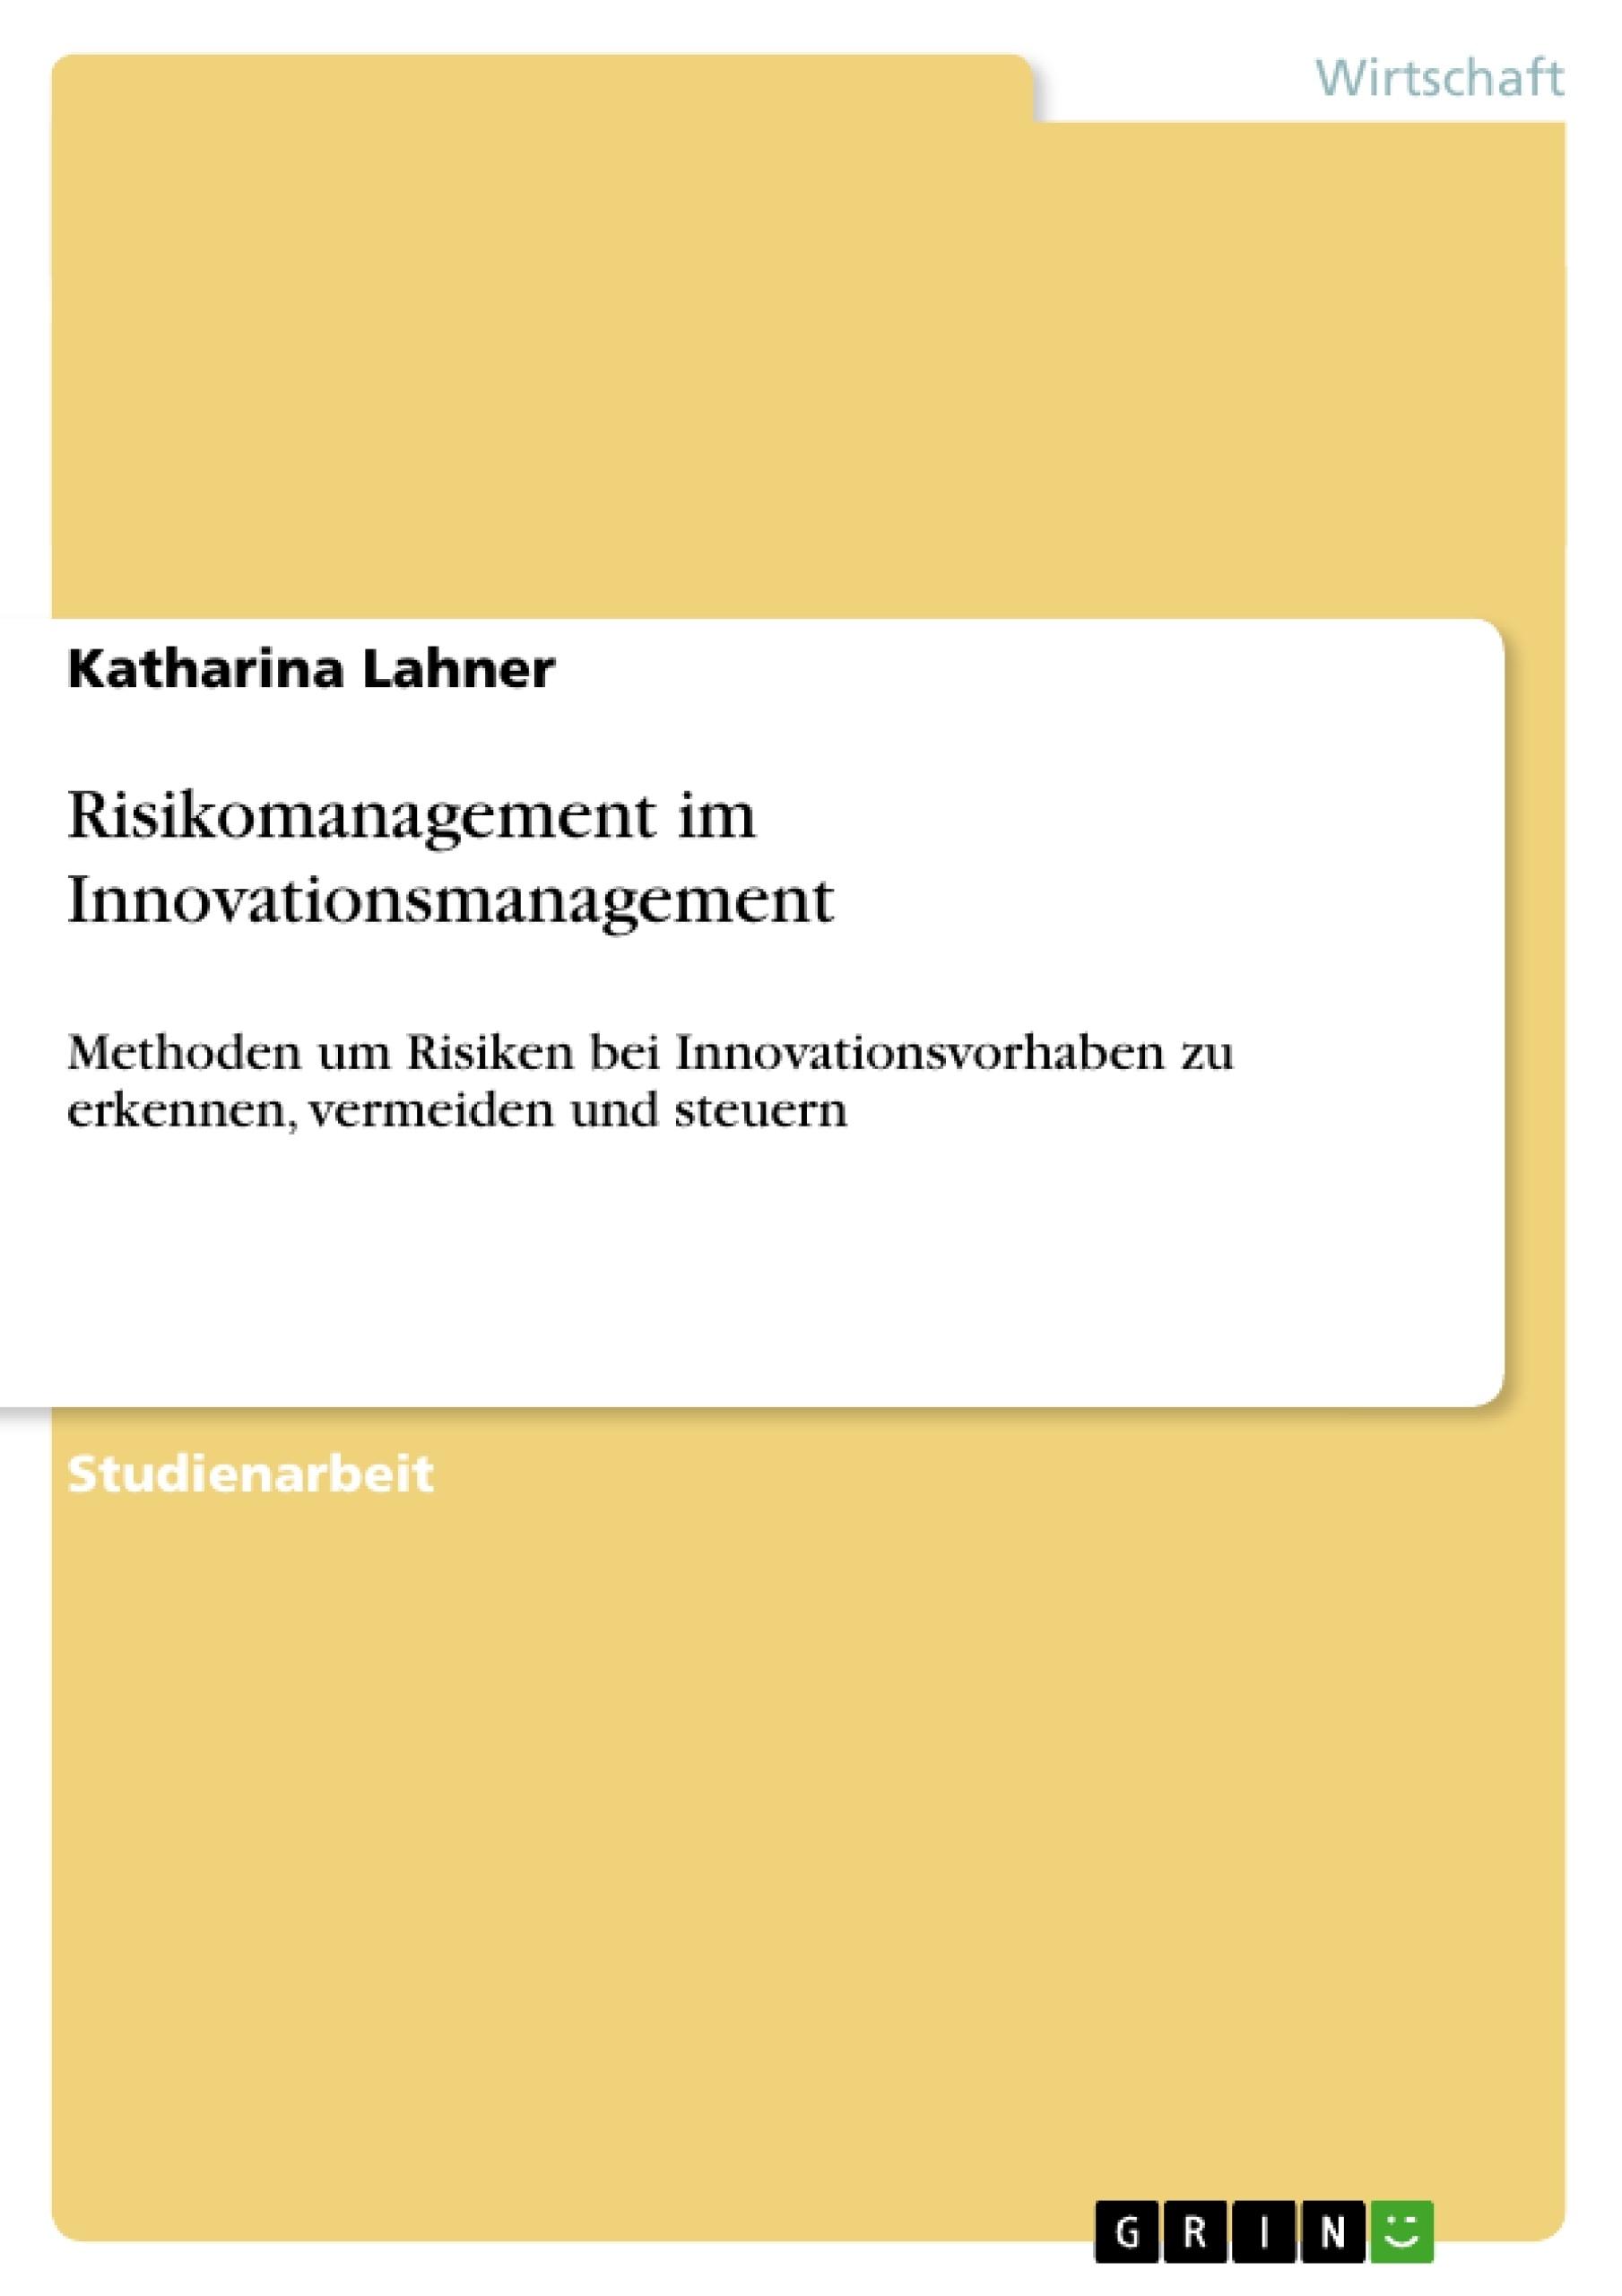 Titel: Risikomanagement im Innovationsmanagement